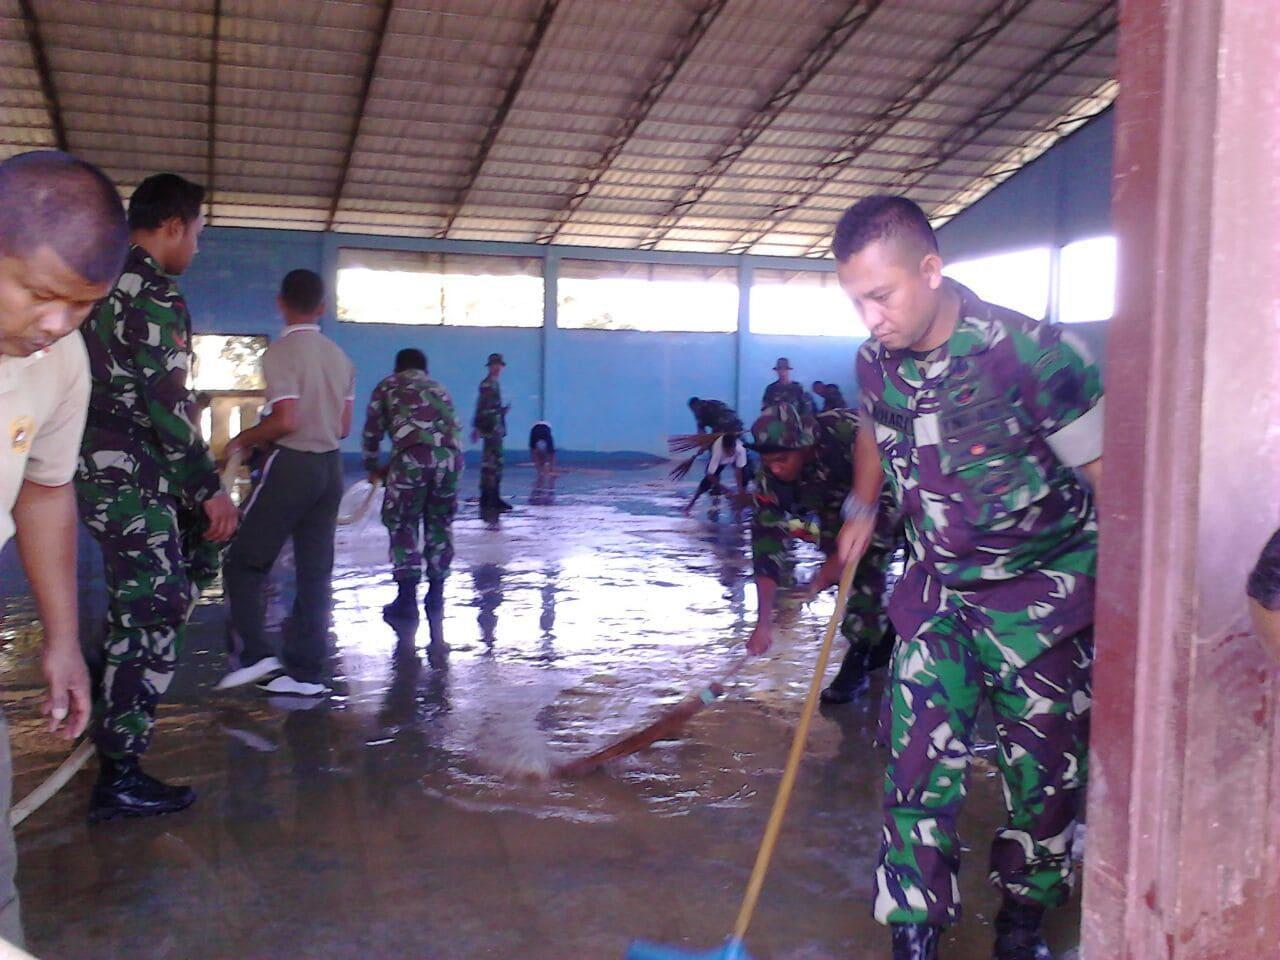 TNI Tanggap Bencana, Bersihkan Sekolah Pasca Banjir